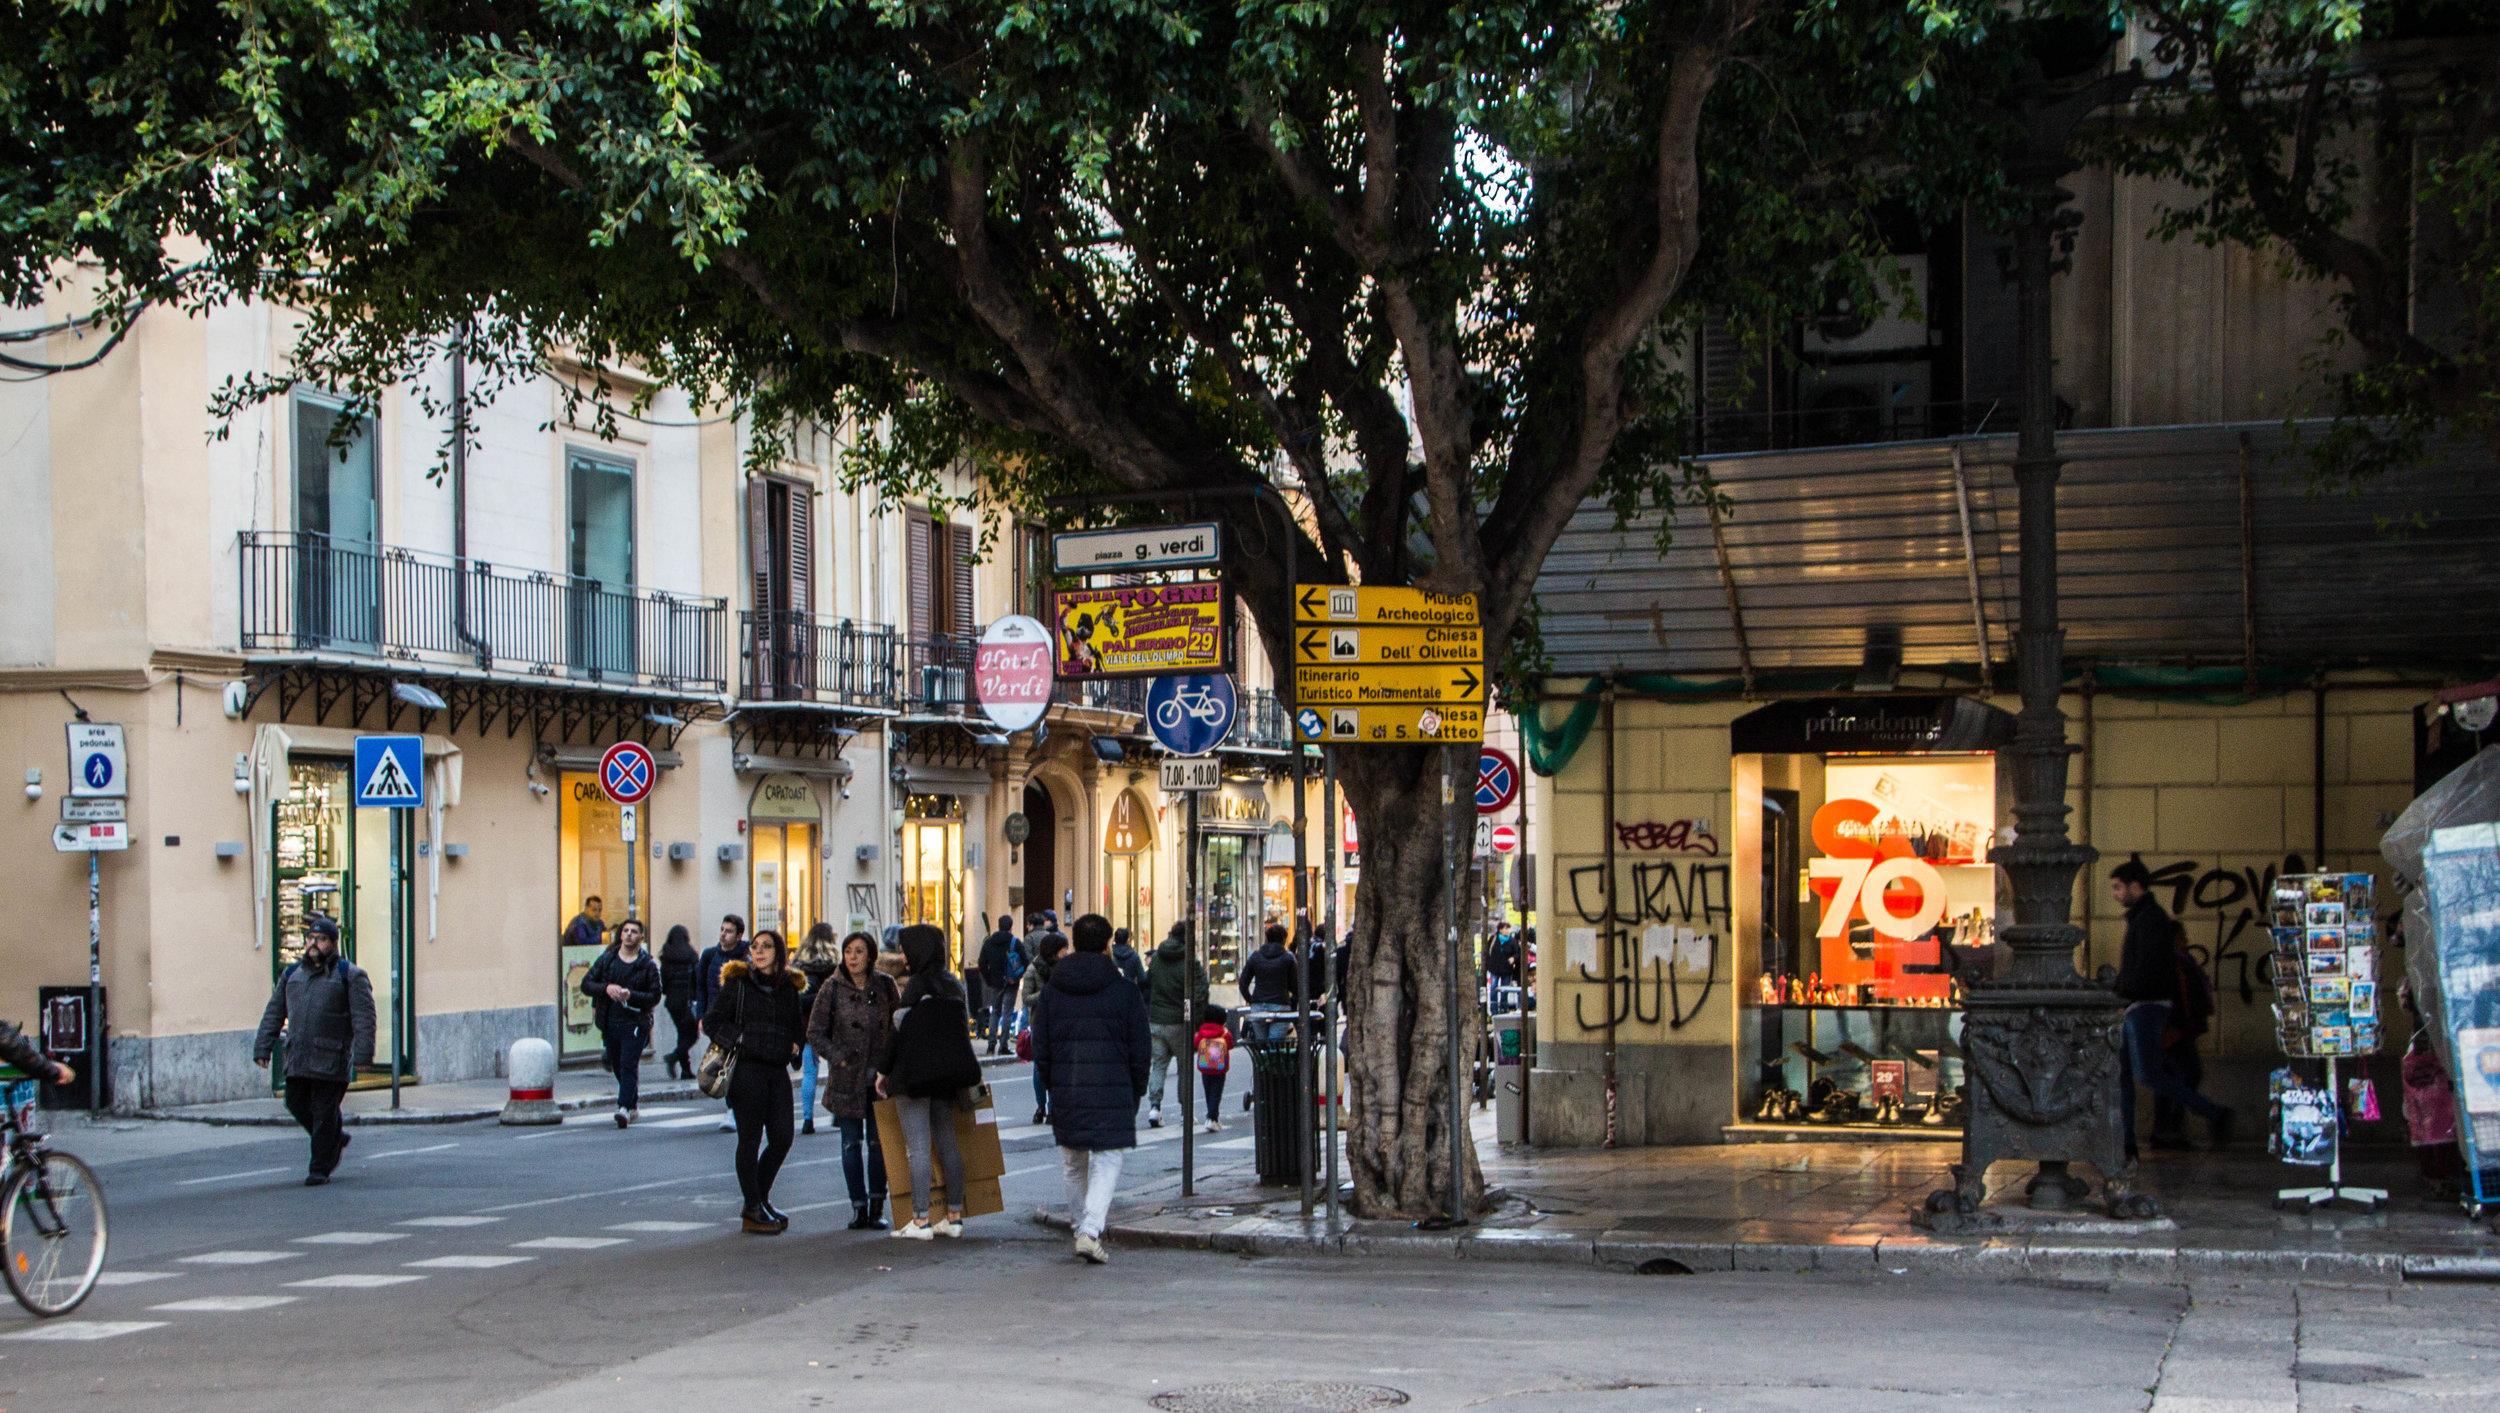 streets-palermo-sicily-23.jpg